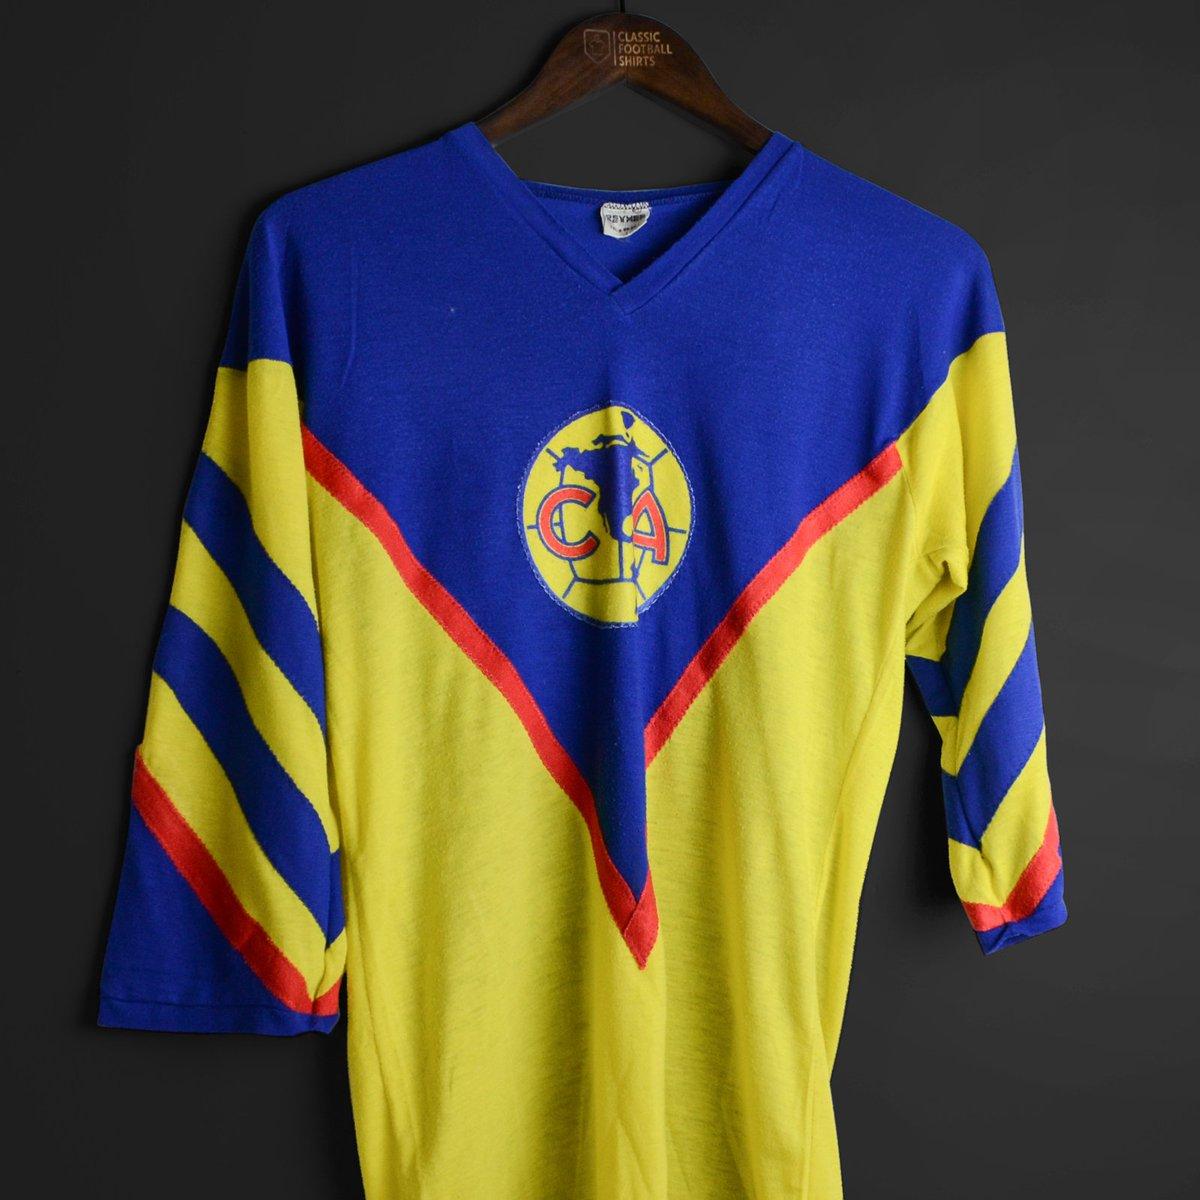 buy popular e42c6 90110 Classic Football Shirts on Twitter: